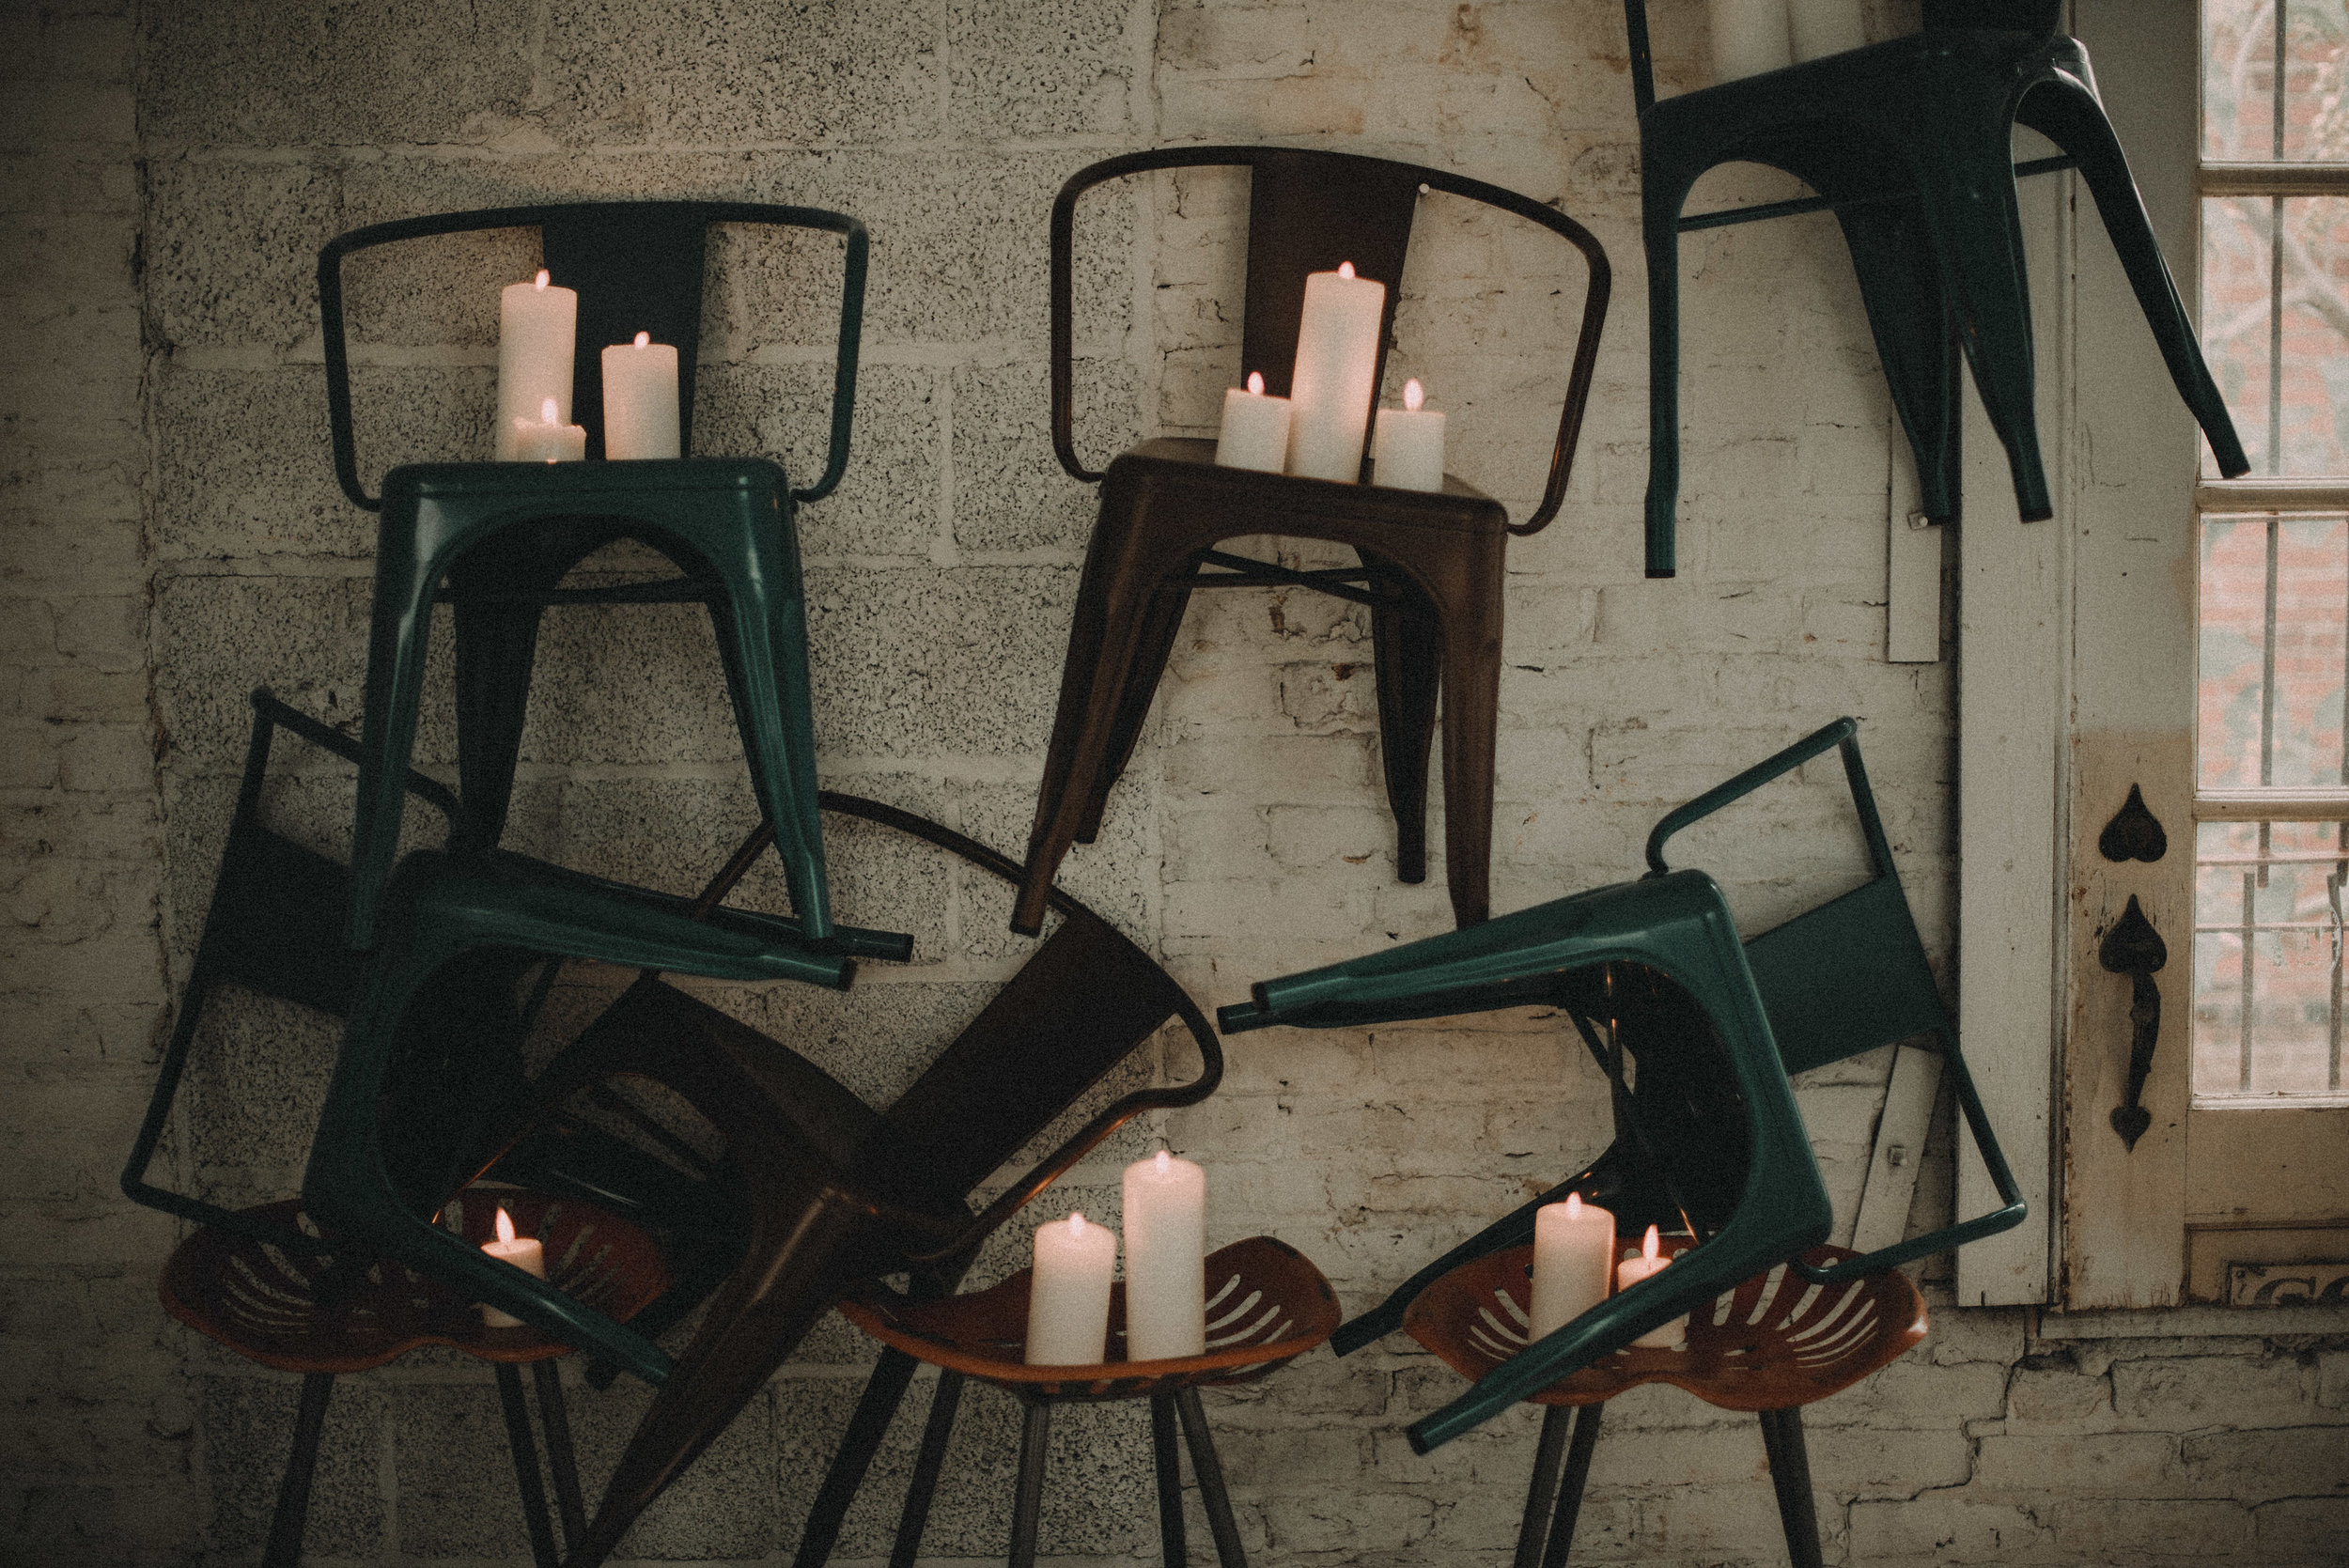 Chairs levitating on brick wall